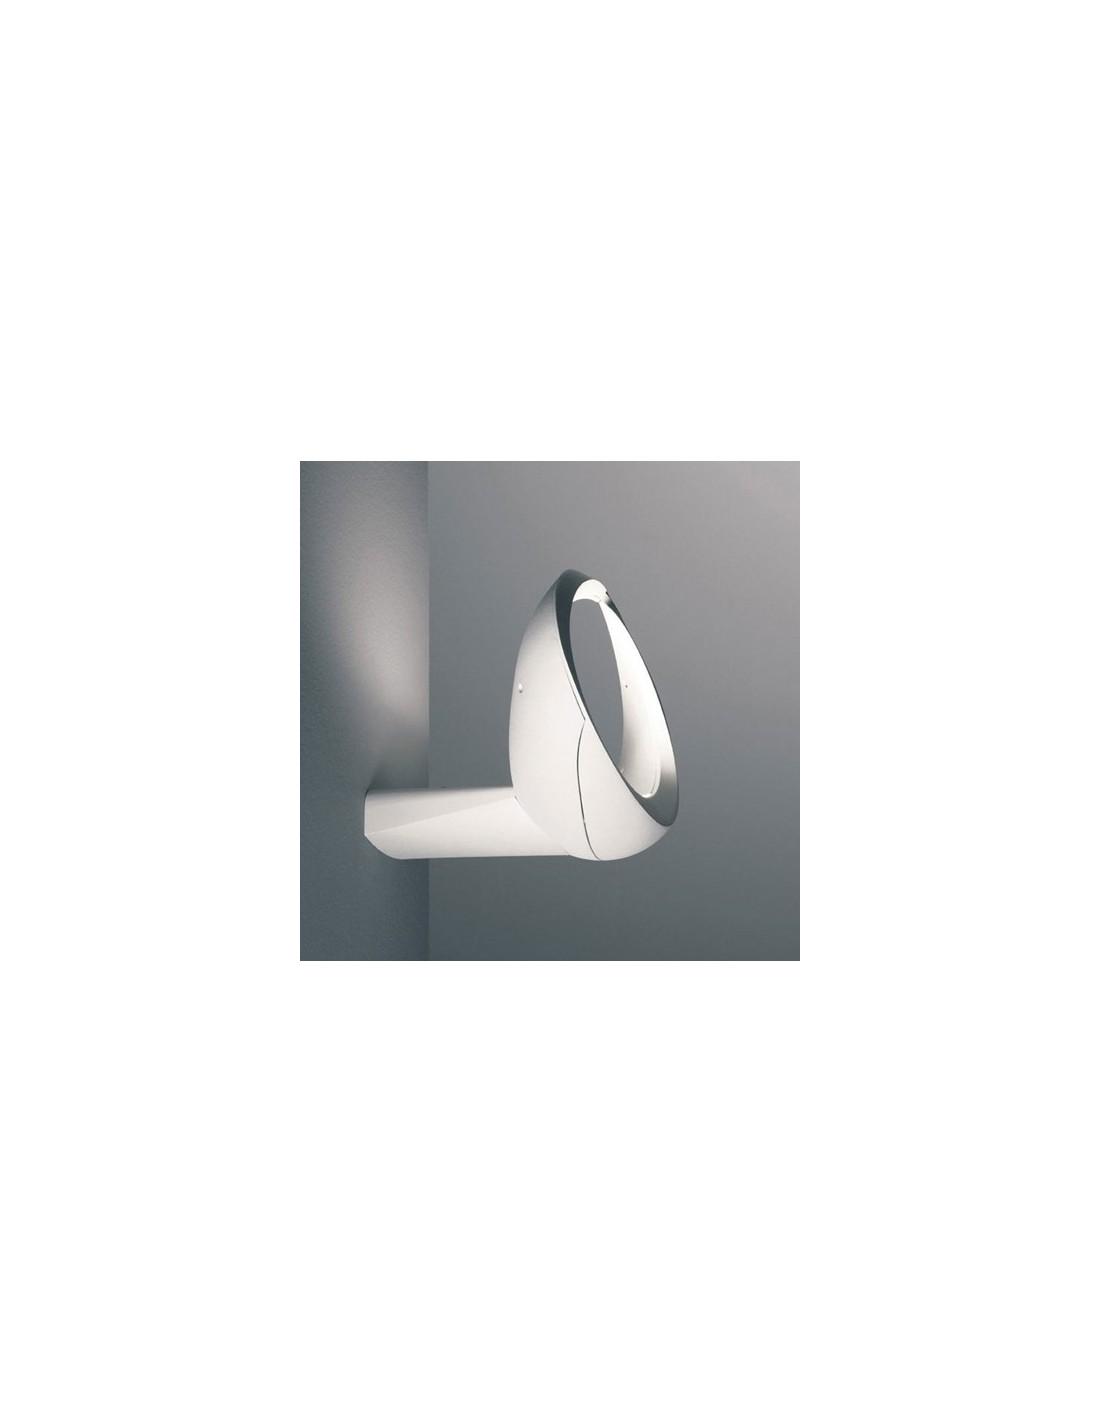 applique cabildo led dimmable blanche artemide. Black Bedroom Furniture Sets. Home Design Ideas